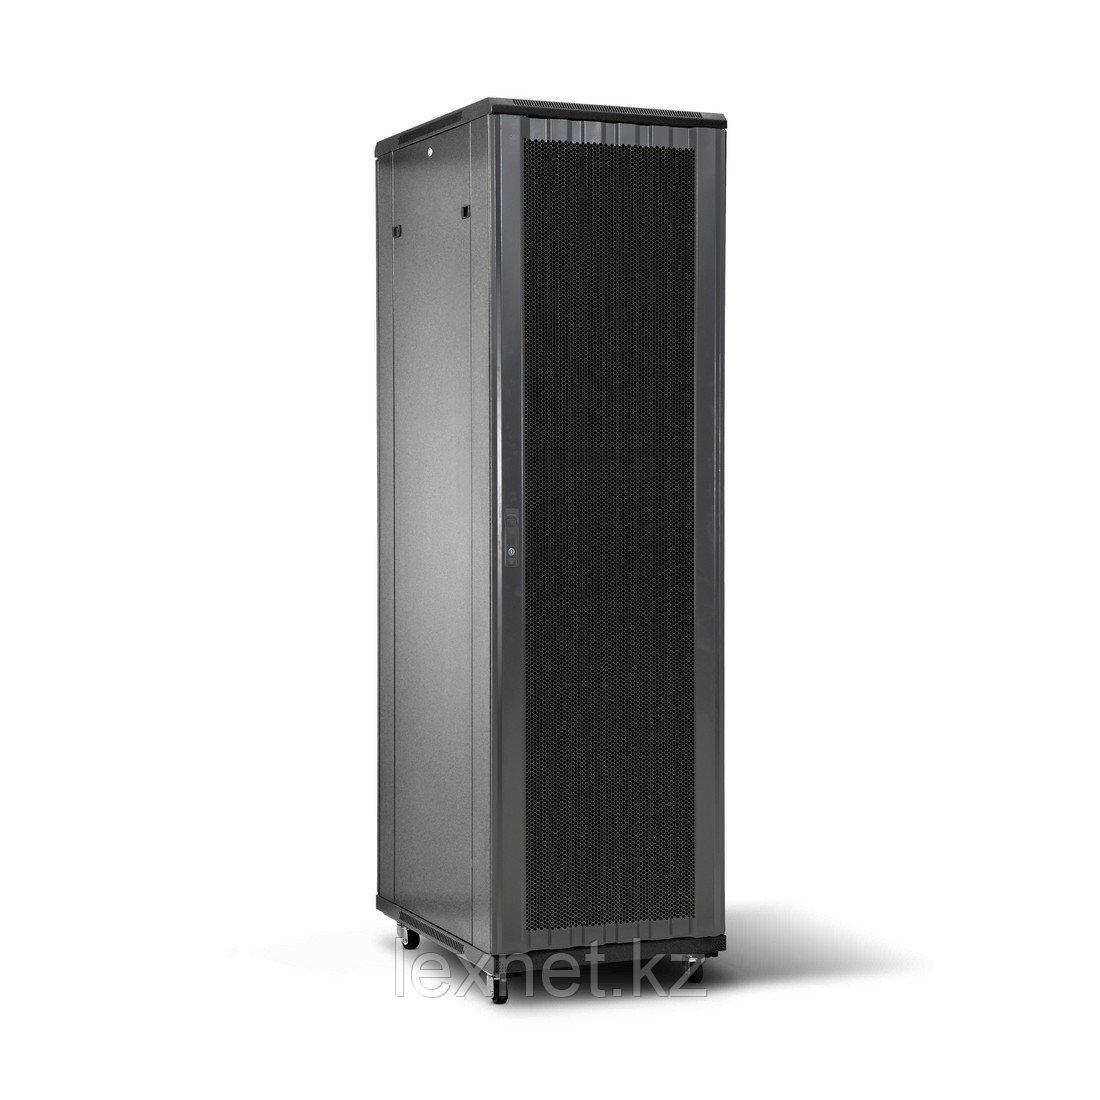 Шкаф серверный SHIP 601S.6842.54.100 42U 600*800*2000 мм